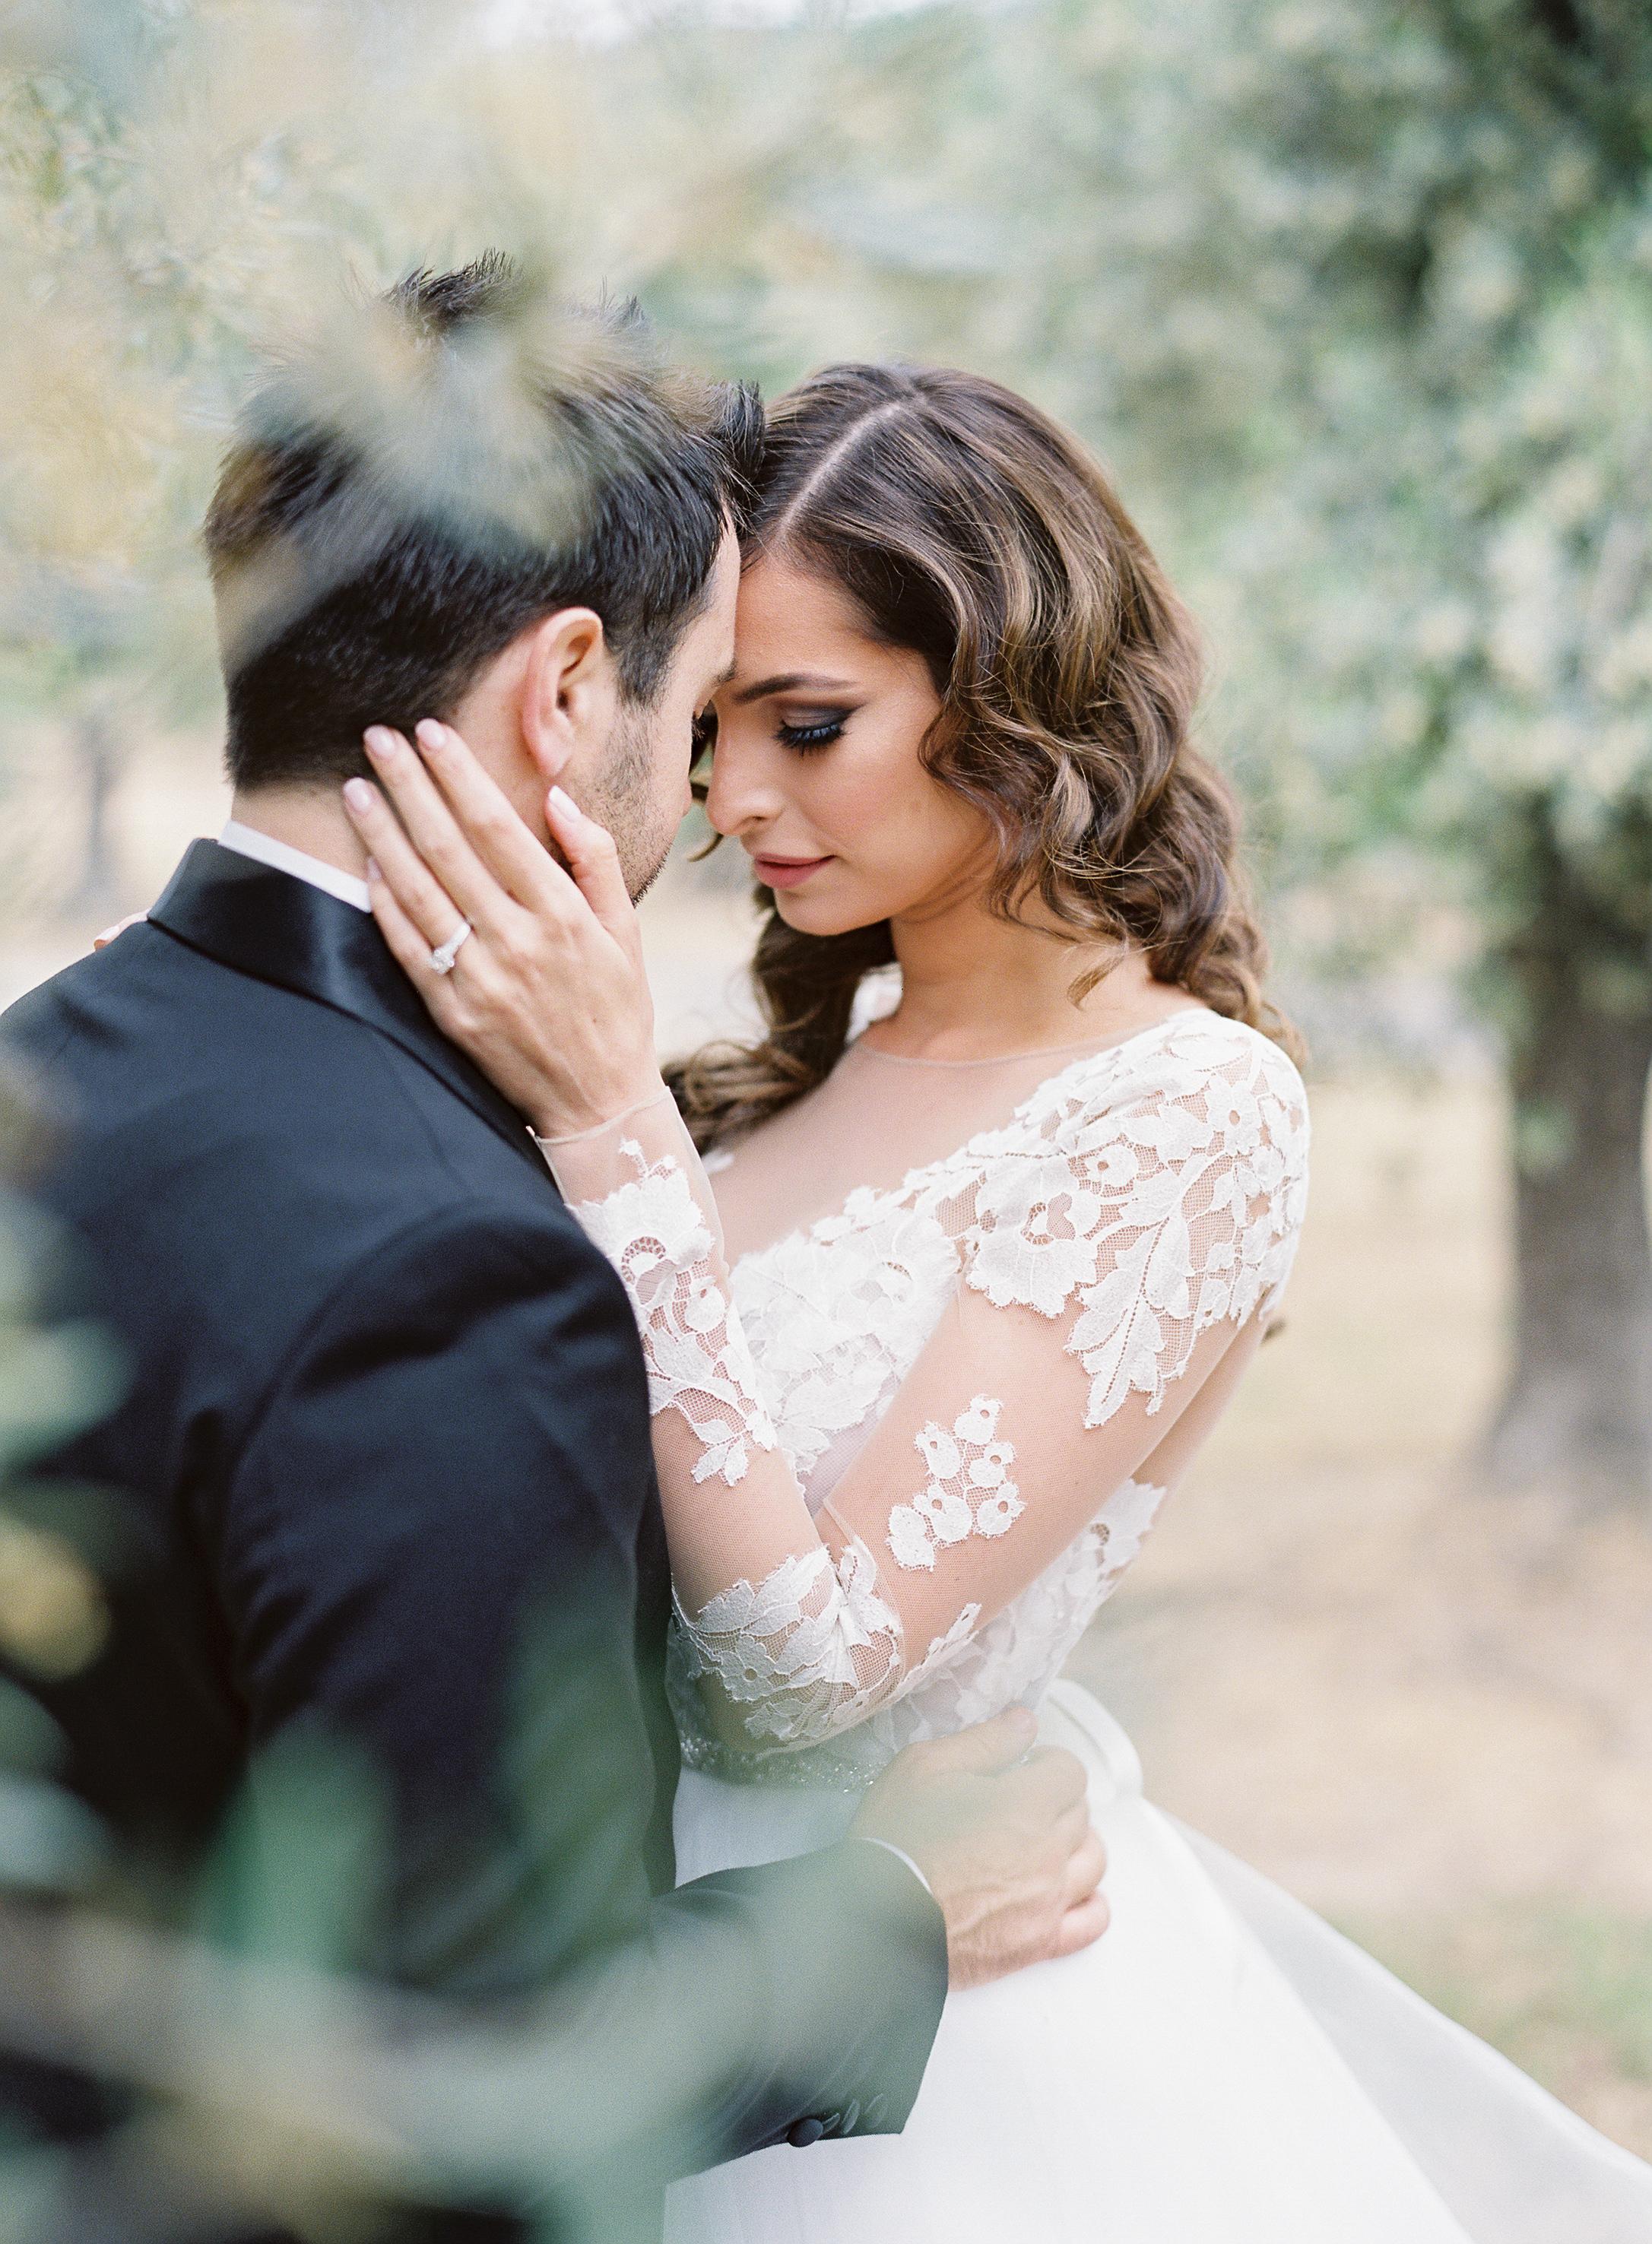 Meghan Mehan Photography   Fine Art Film Wedding Photographer   California   San Francisco   Napa   Sonoma   Santa Barbara   Big Sur   Destination Wedding Photographer 056.jpg